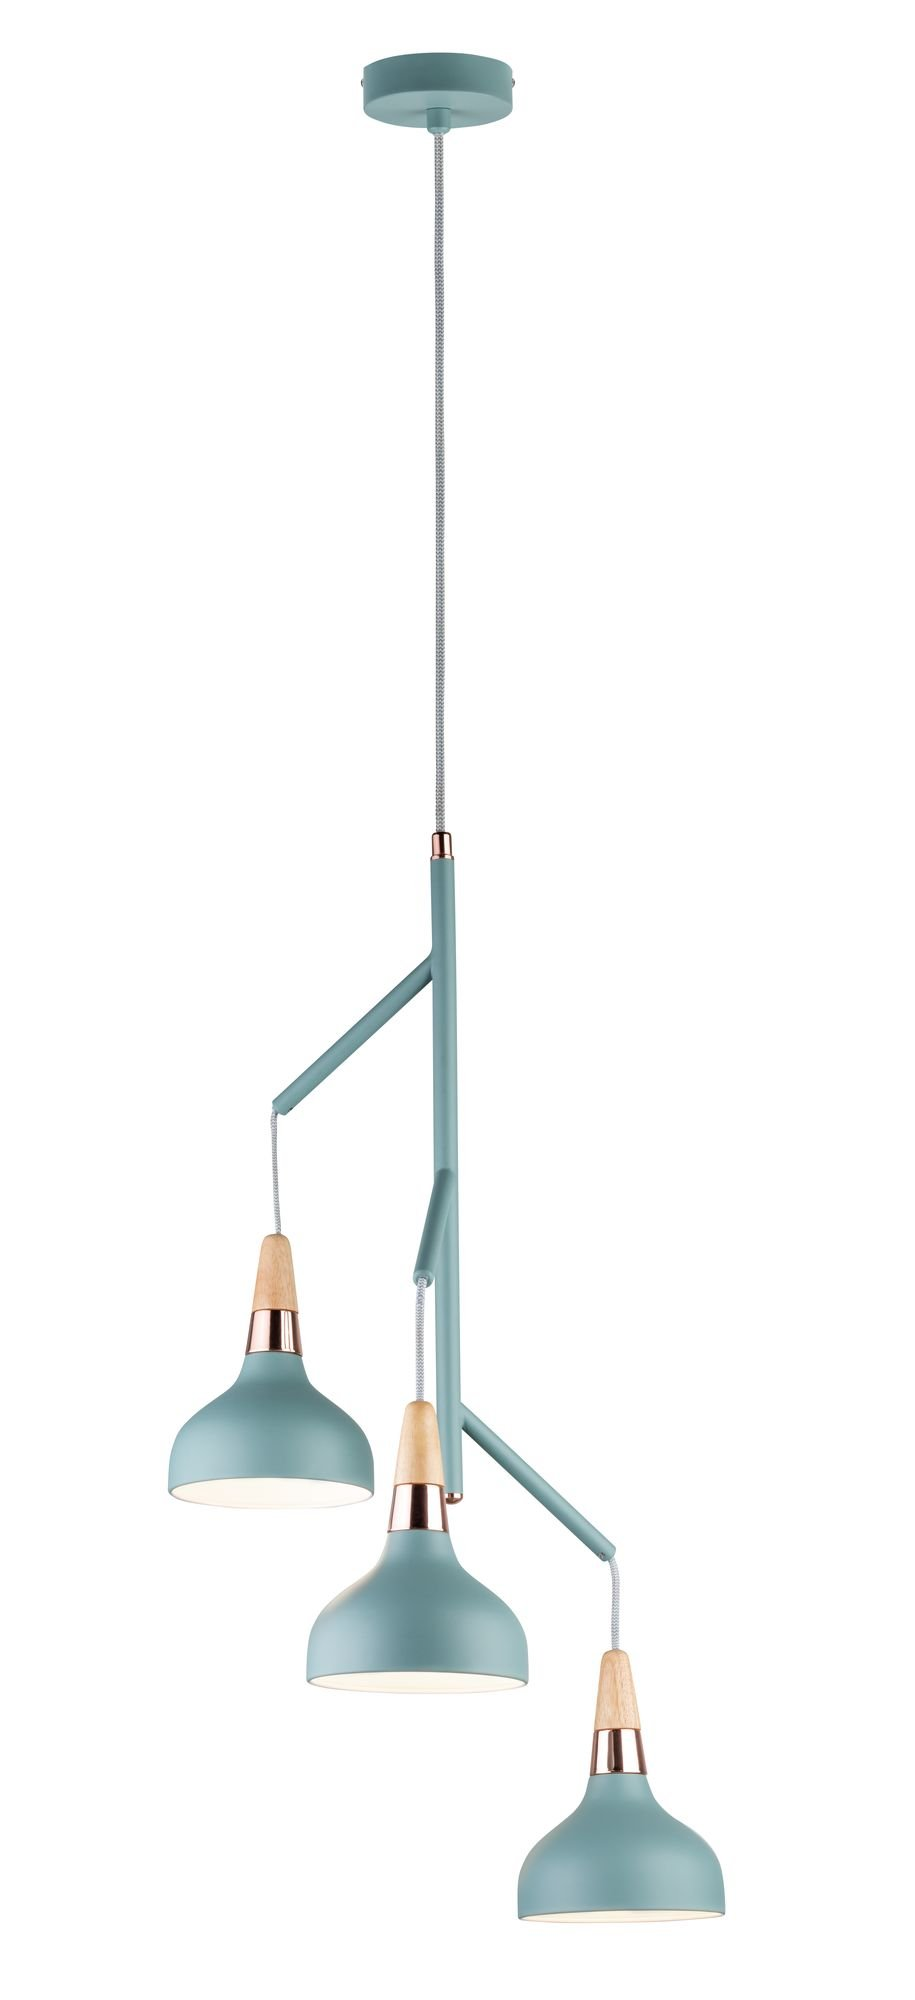 Neordic Pendelleuchte Juna E14 max. 3x20W Softgrün/Kupfer/Holz Metall/Holz